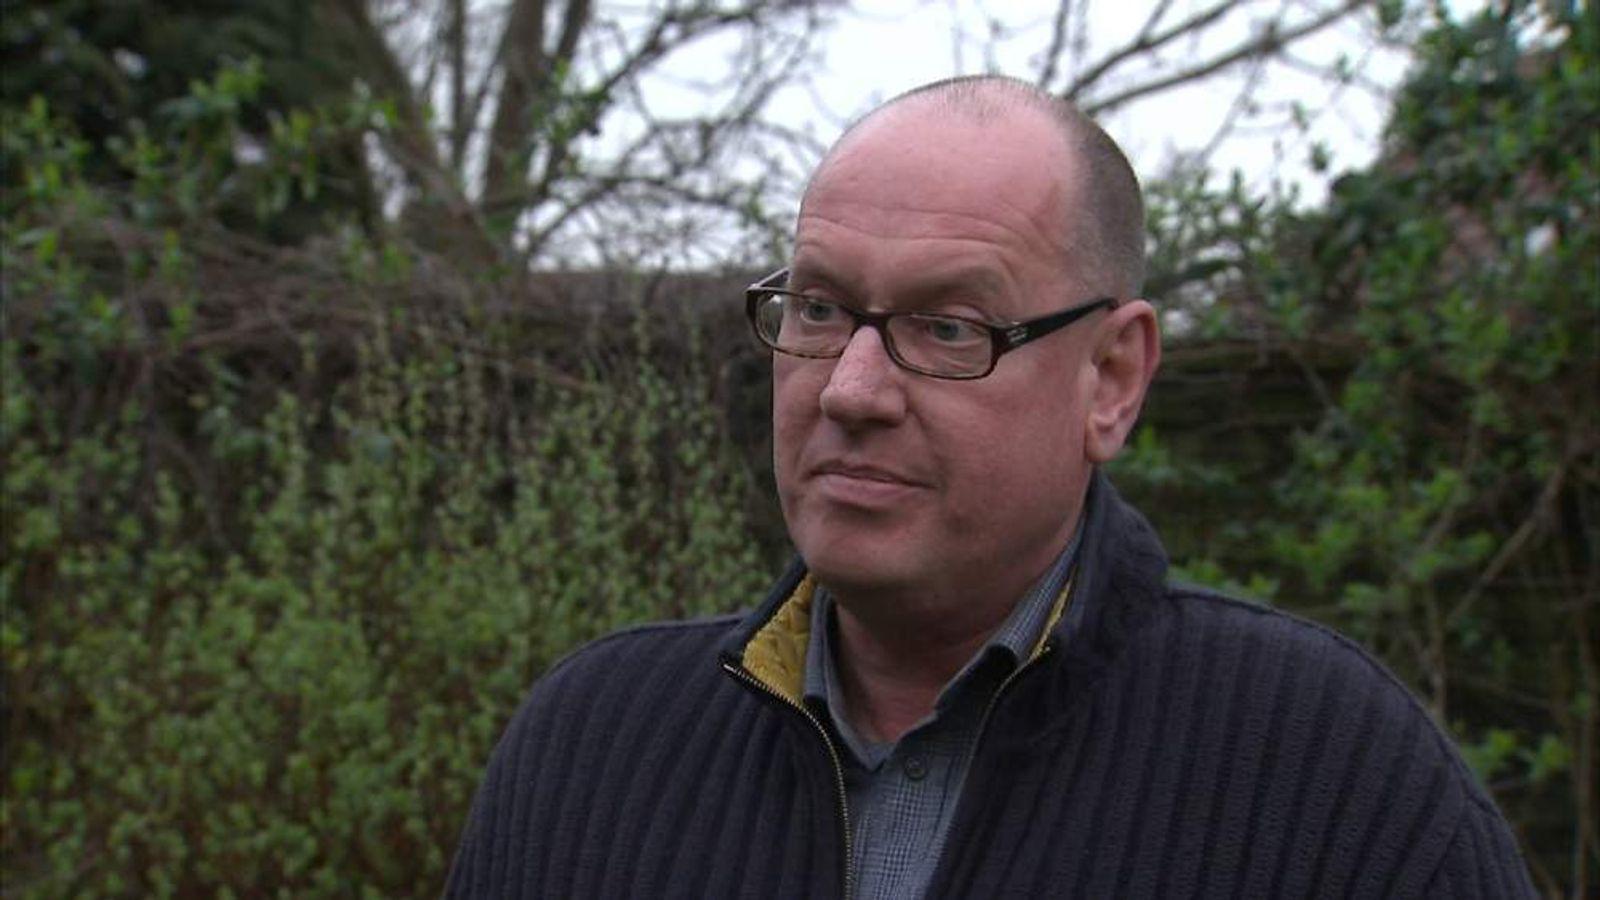 Son of Bradford City chairman Simon Heginbotham